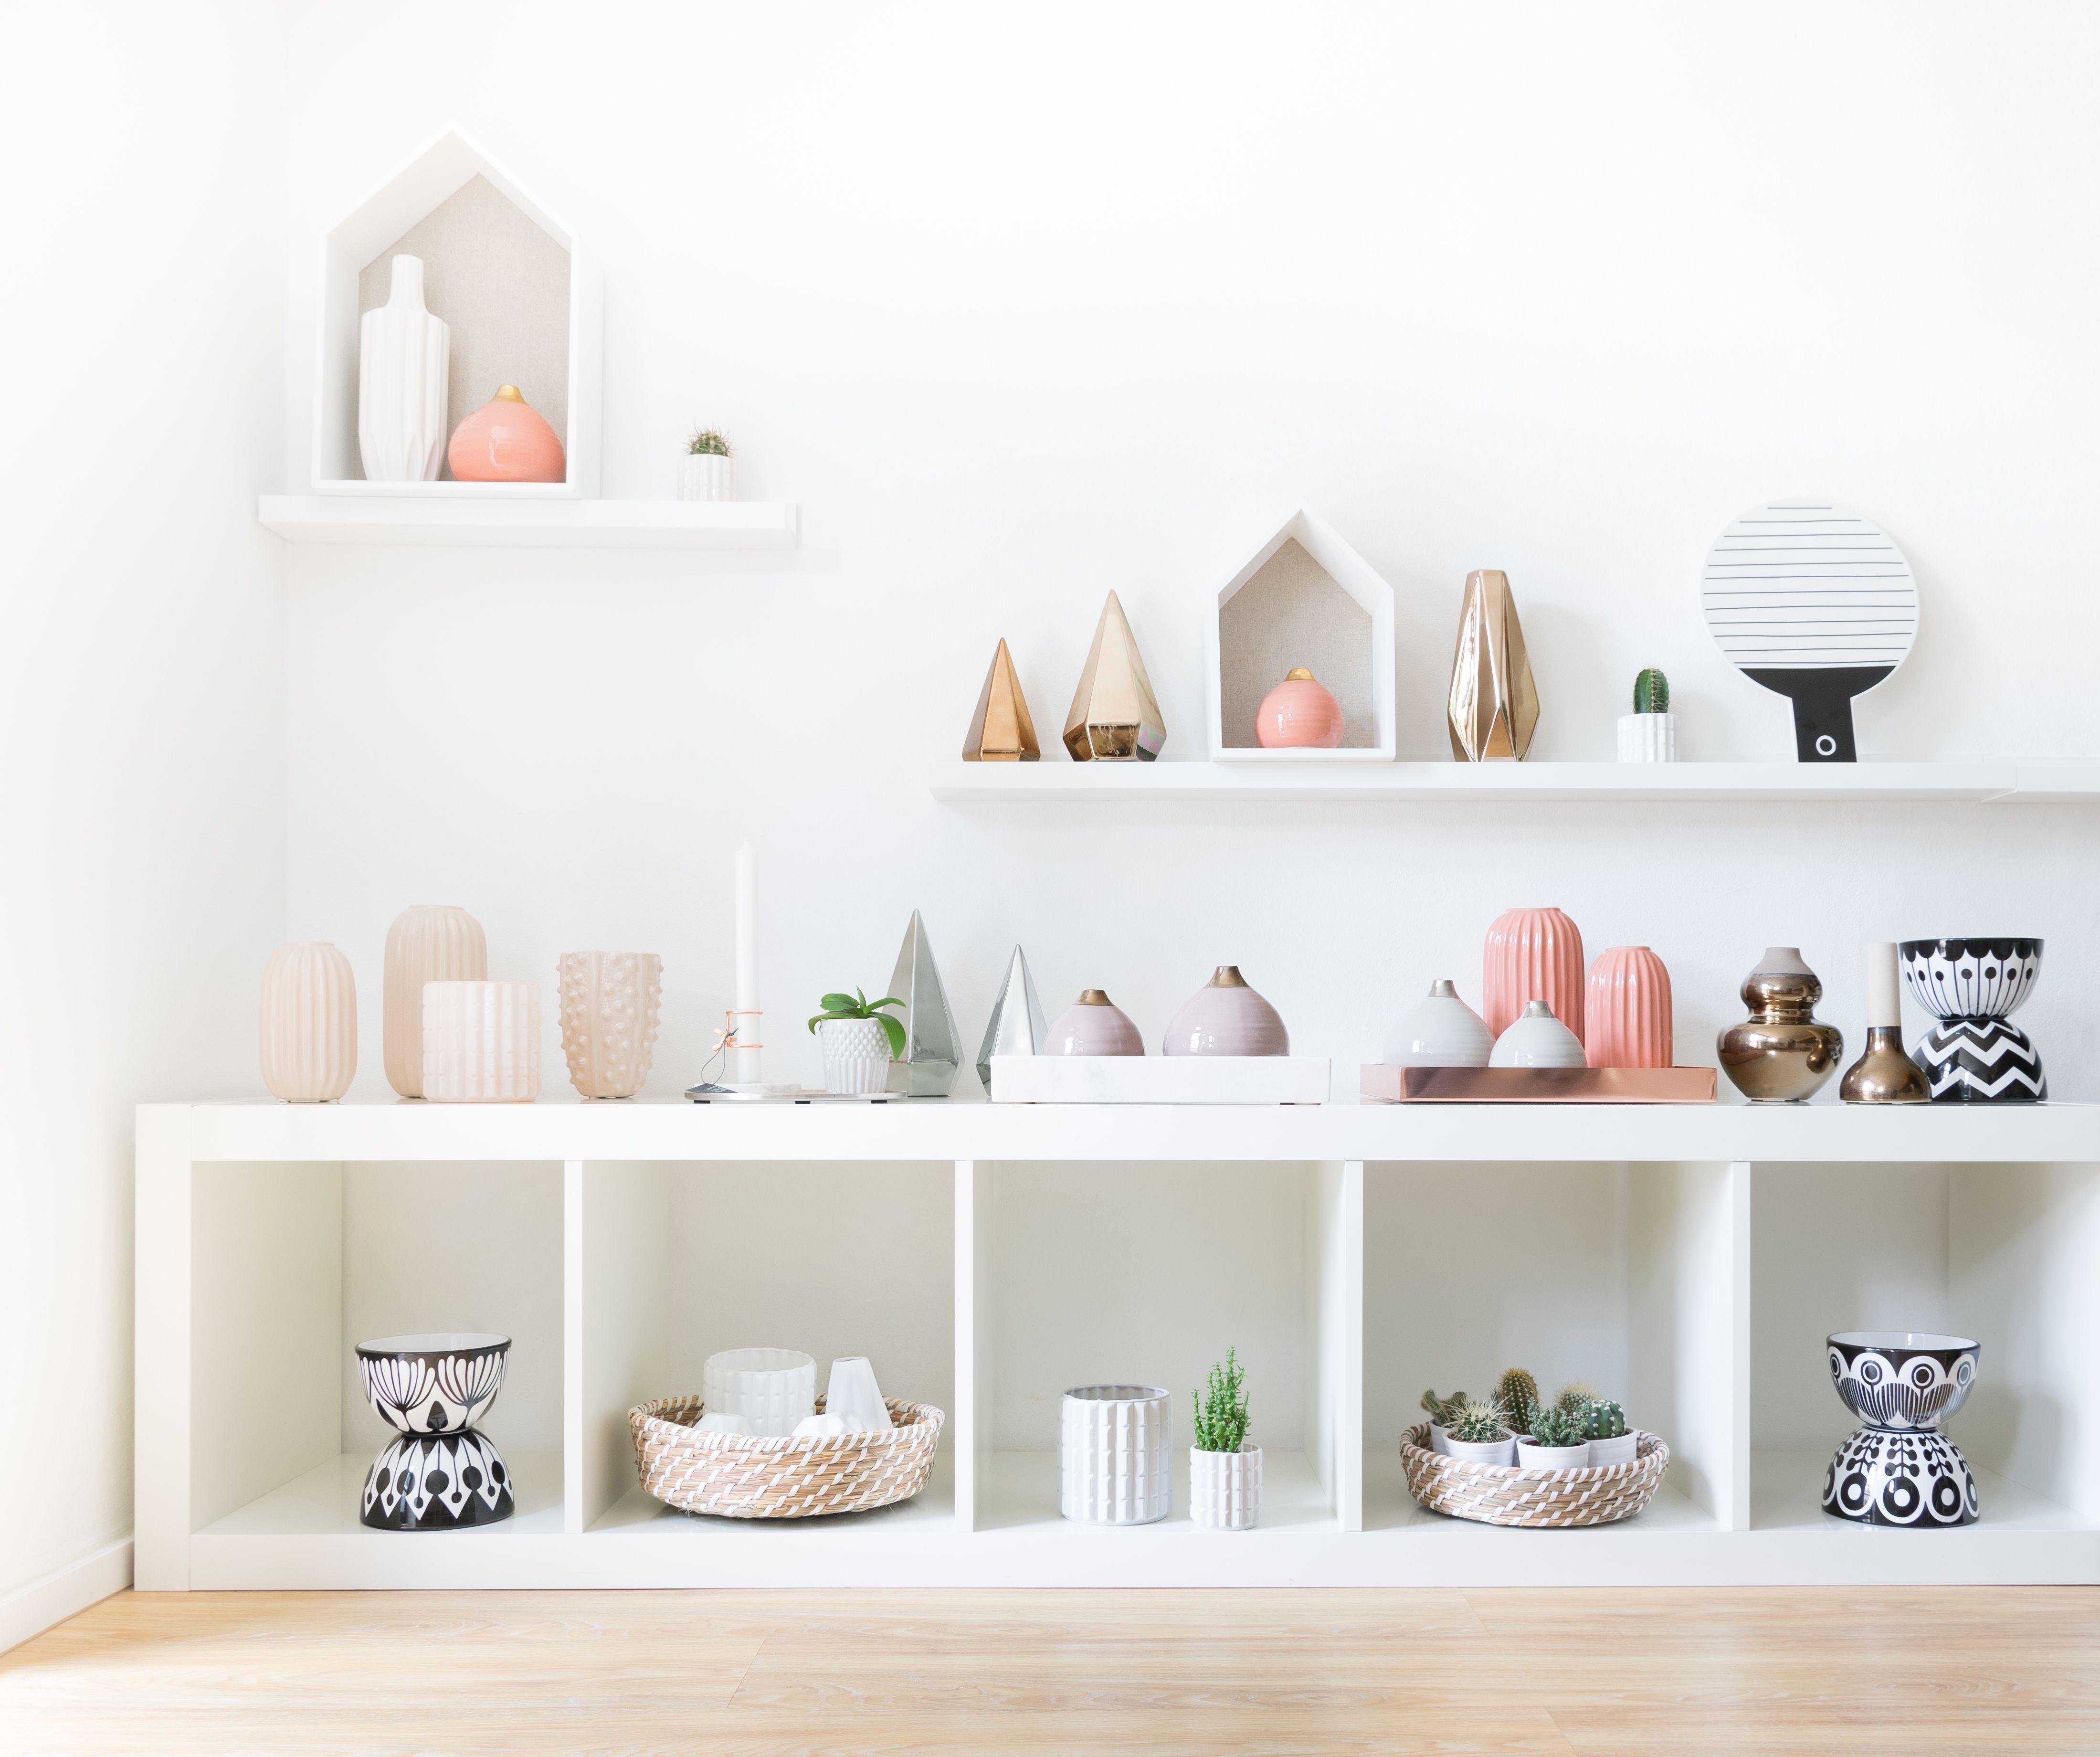 emejing h bsch interior online shop gallery die. Black Bedroom Furniture Sets. Home Design Ideas